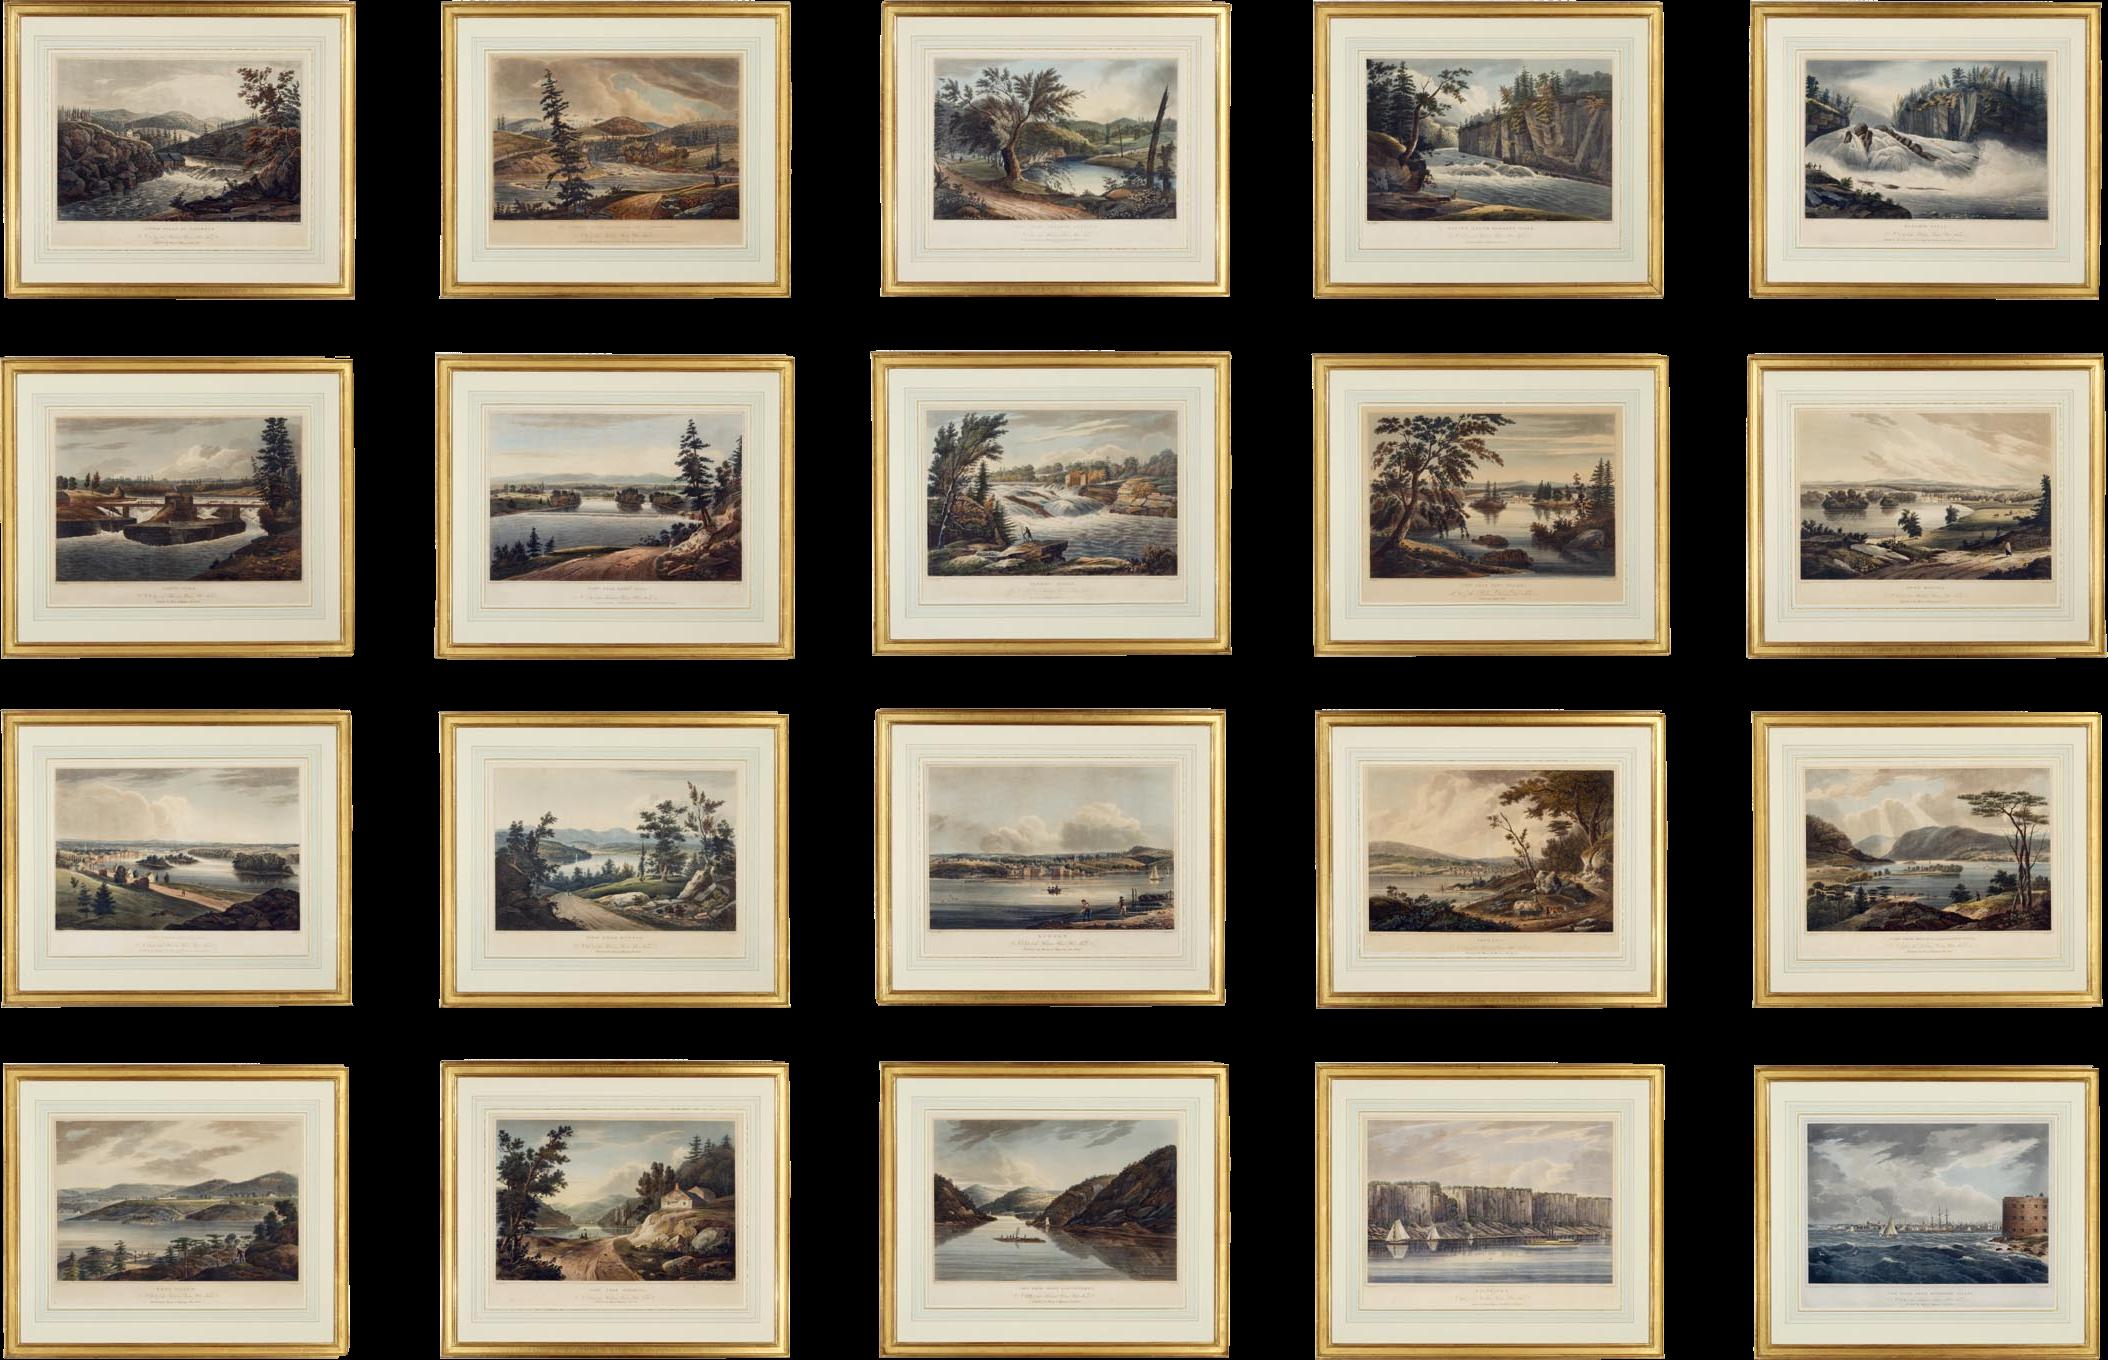 The Hudson River Portfolio - Hudson River Portfolio (c. 1820) - Display (1820)